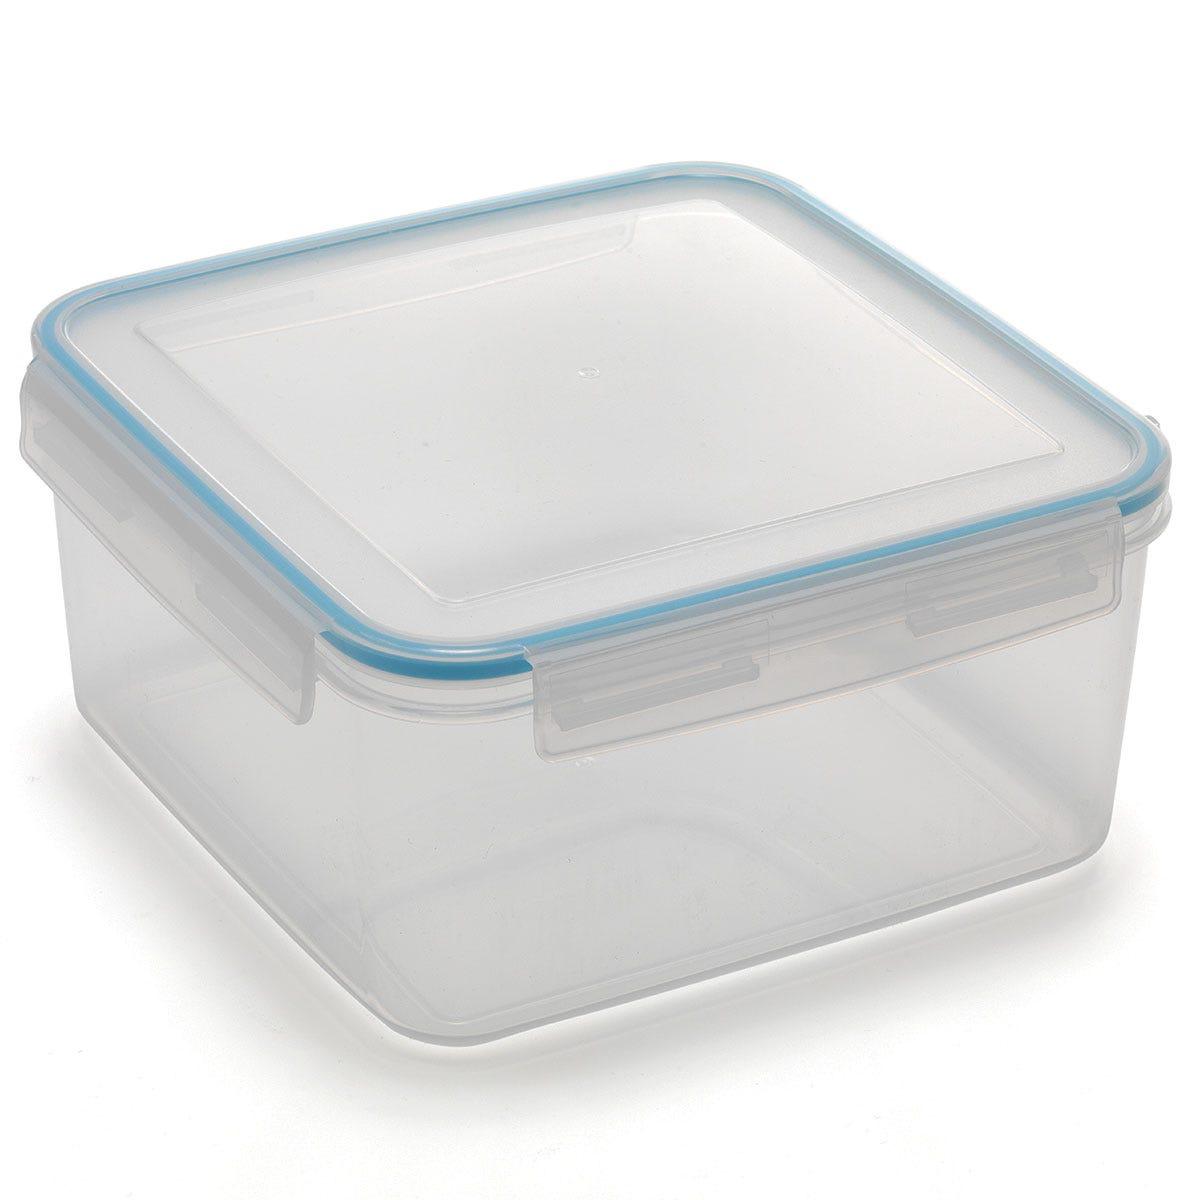 Image of Addis Clip & Close Square Cake Container - 5L